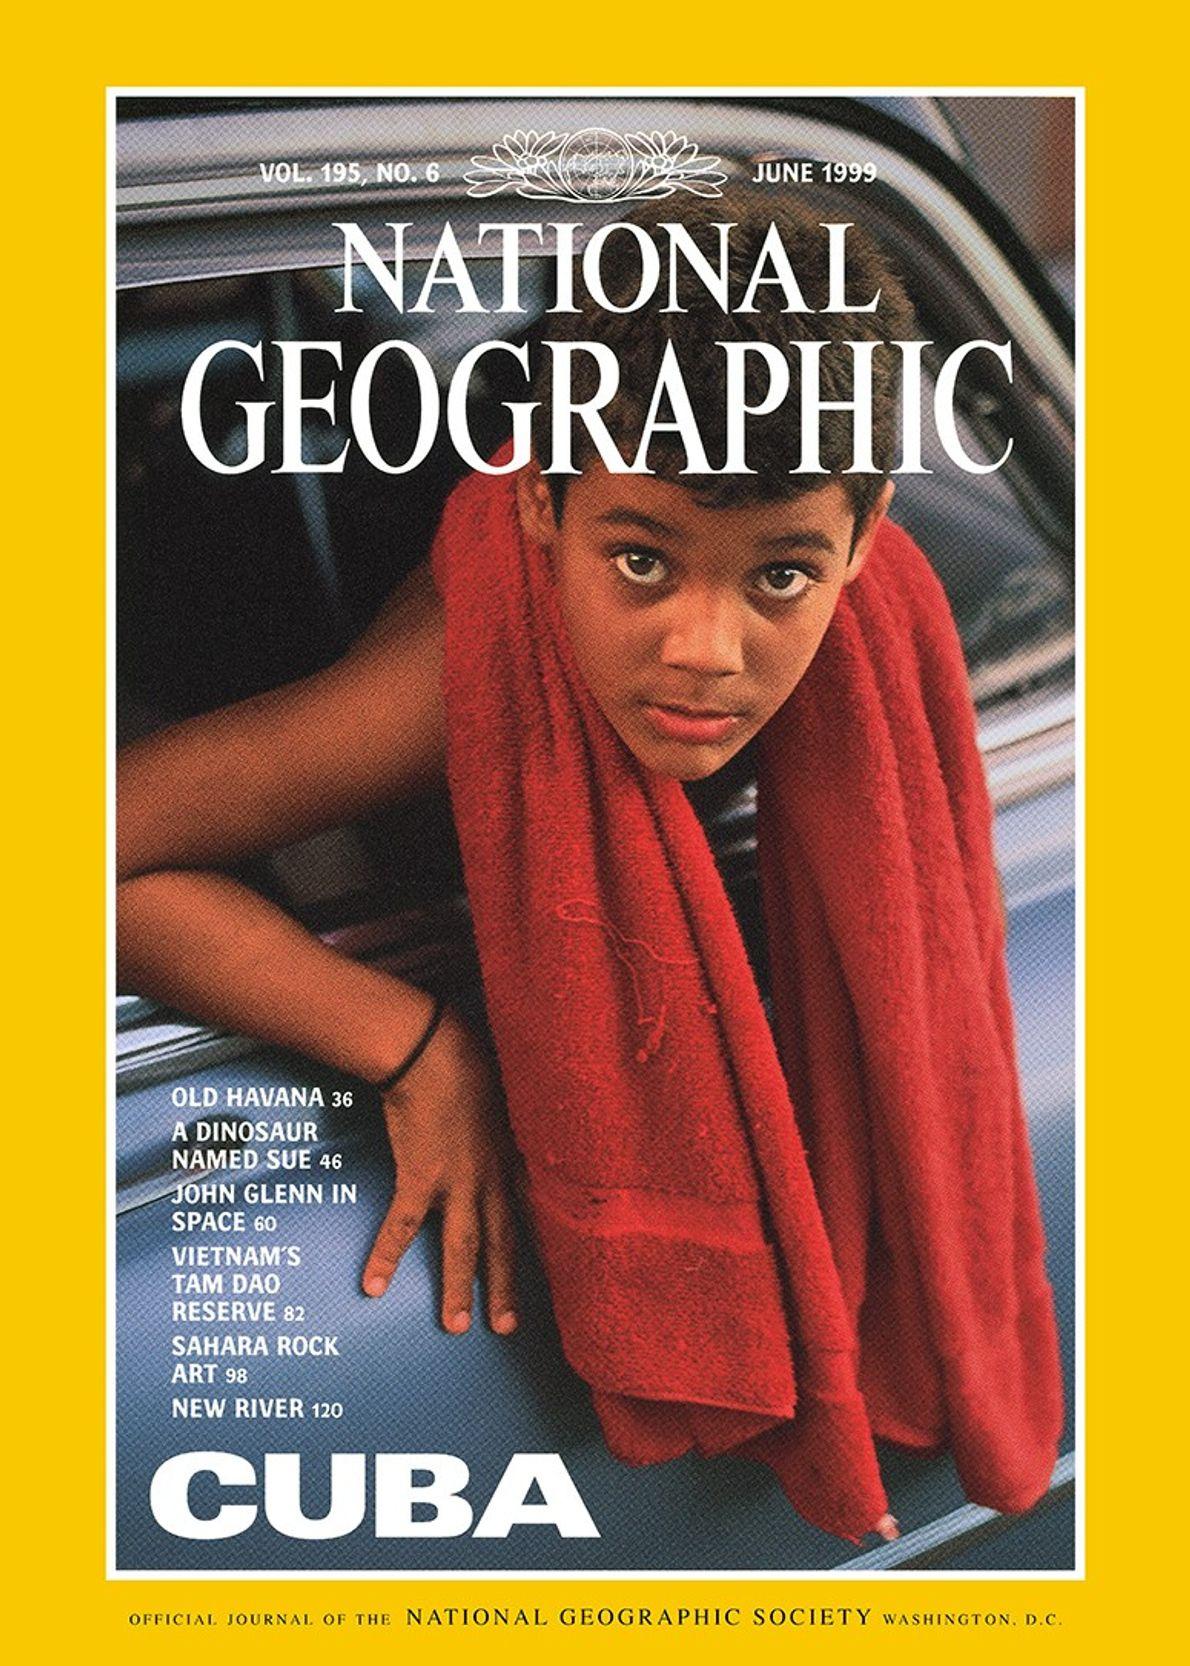 """Cuba"": Titelbild der Juniausgabe der National Geographic 1999."